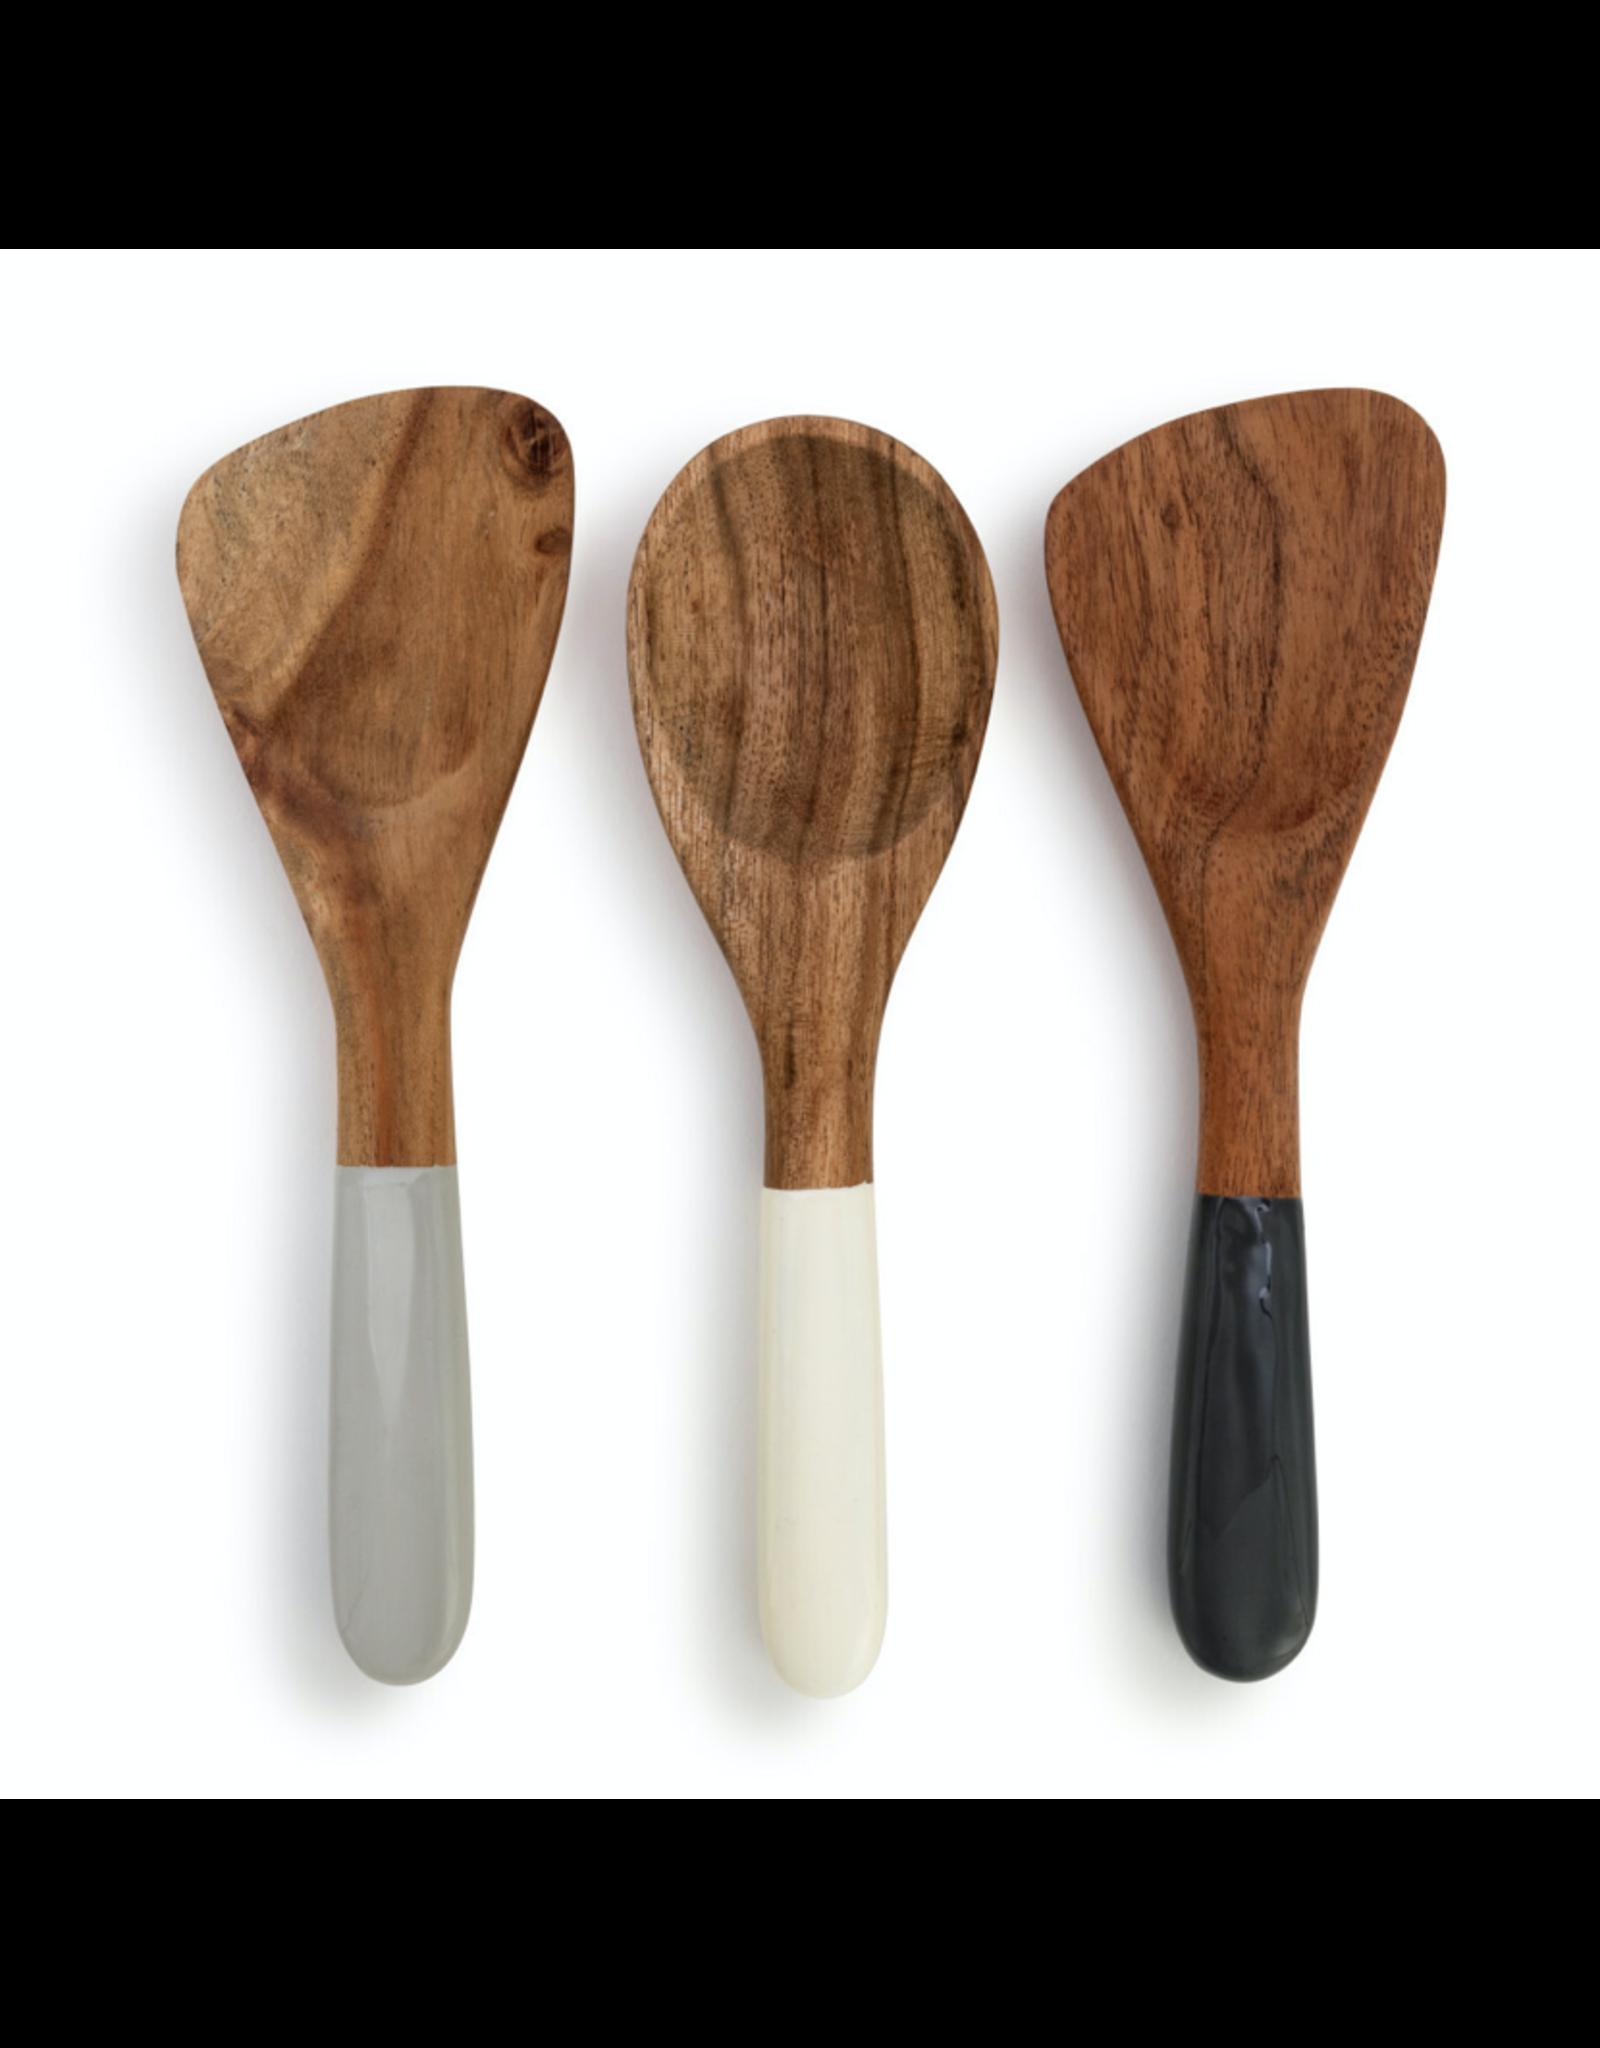 Demdaco Acacia & Resin Appetizer Spoons, set of 3